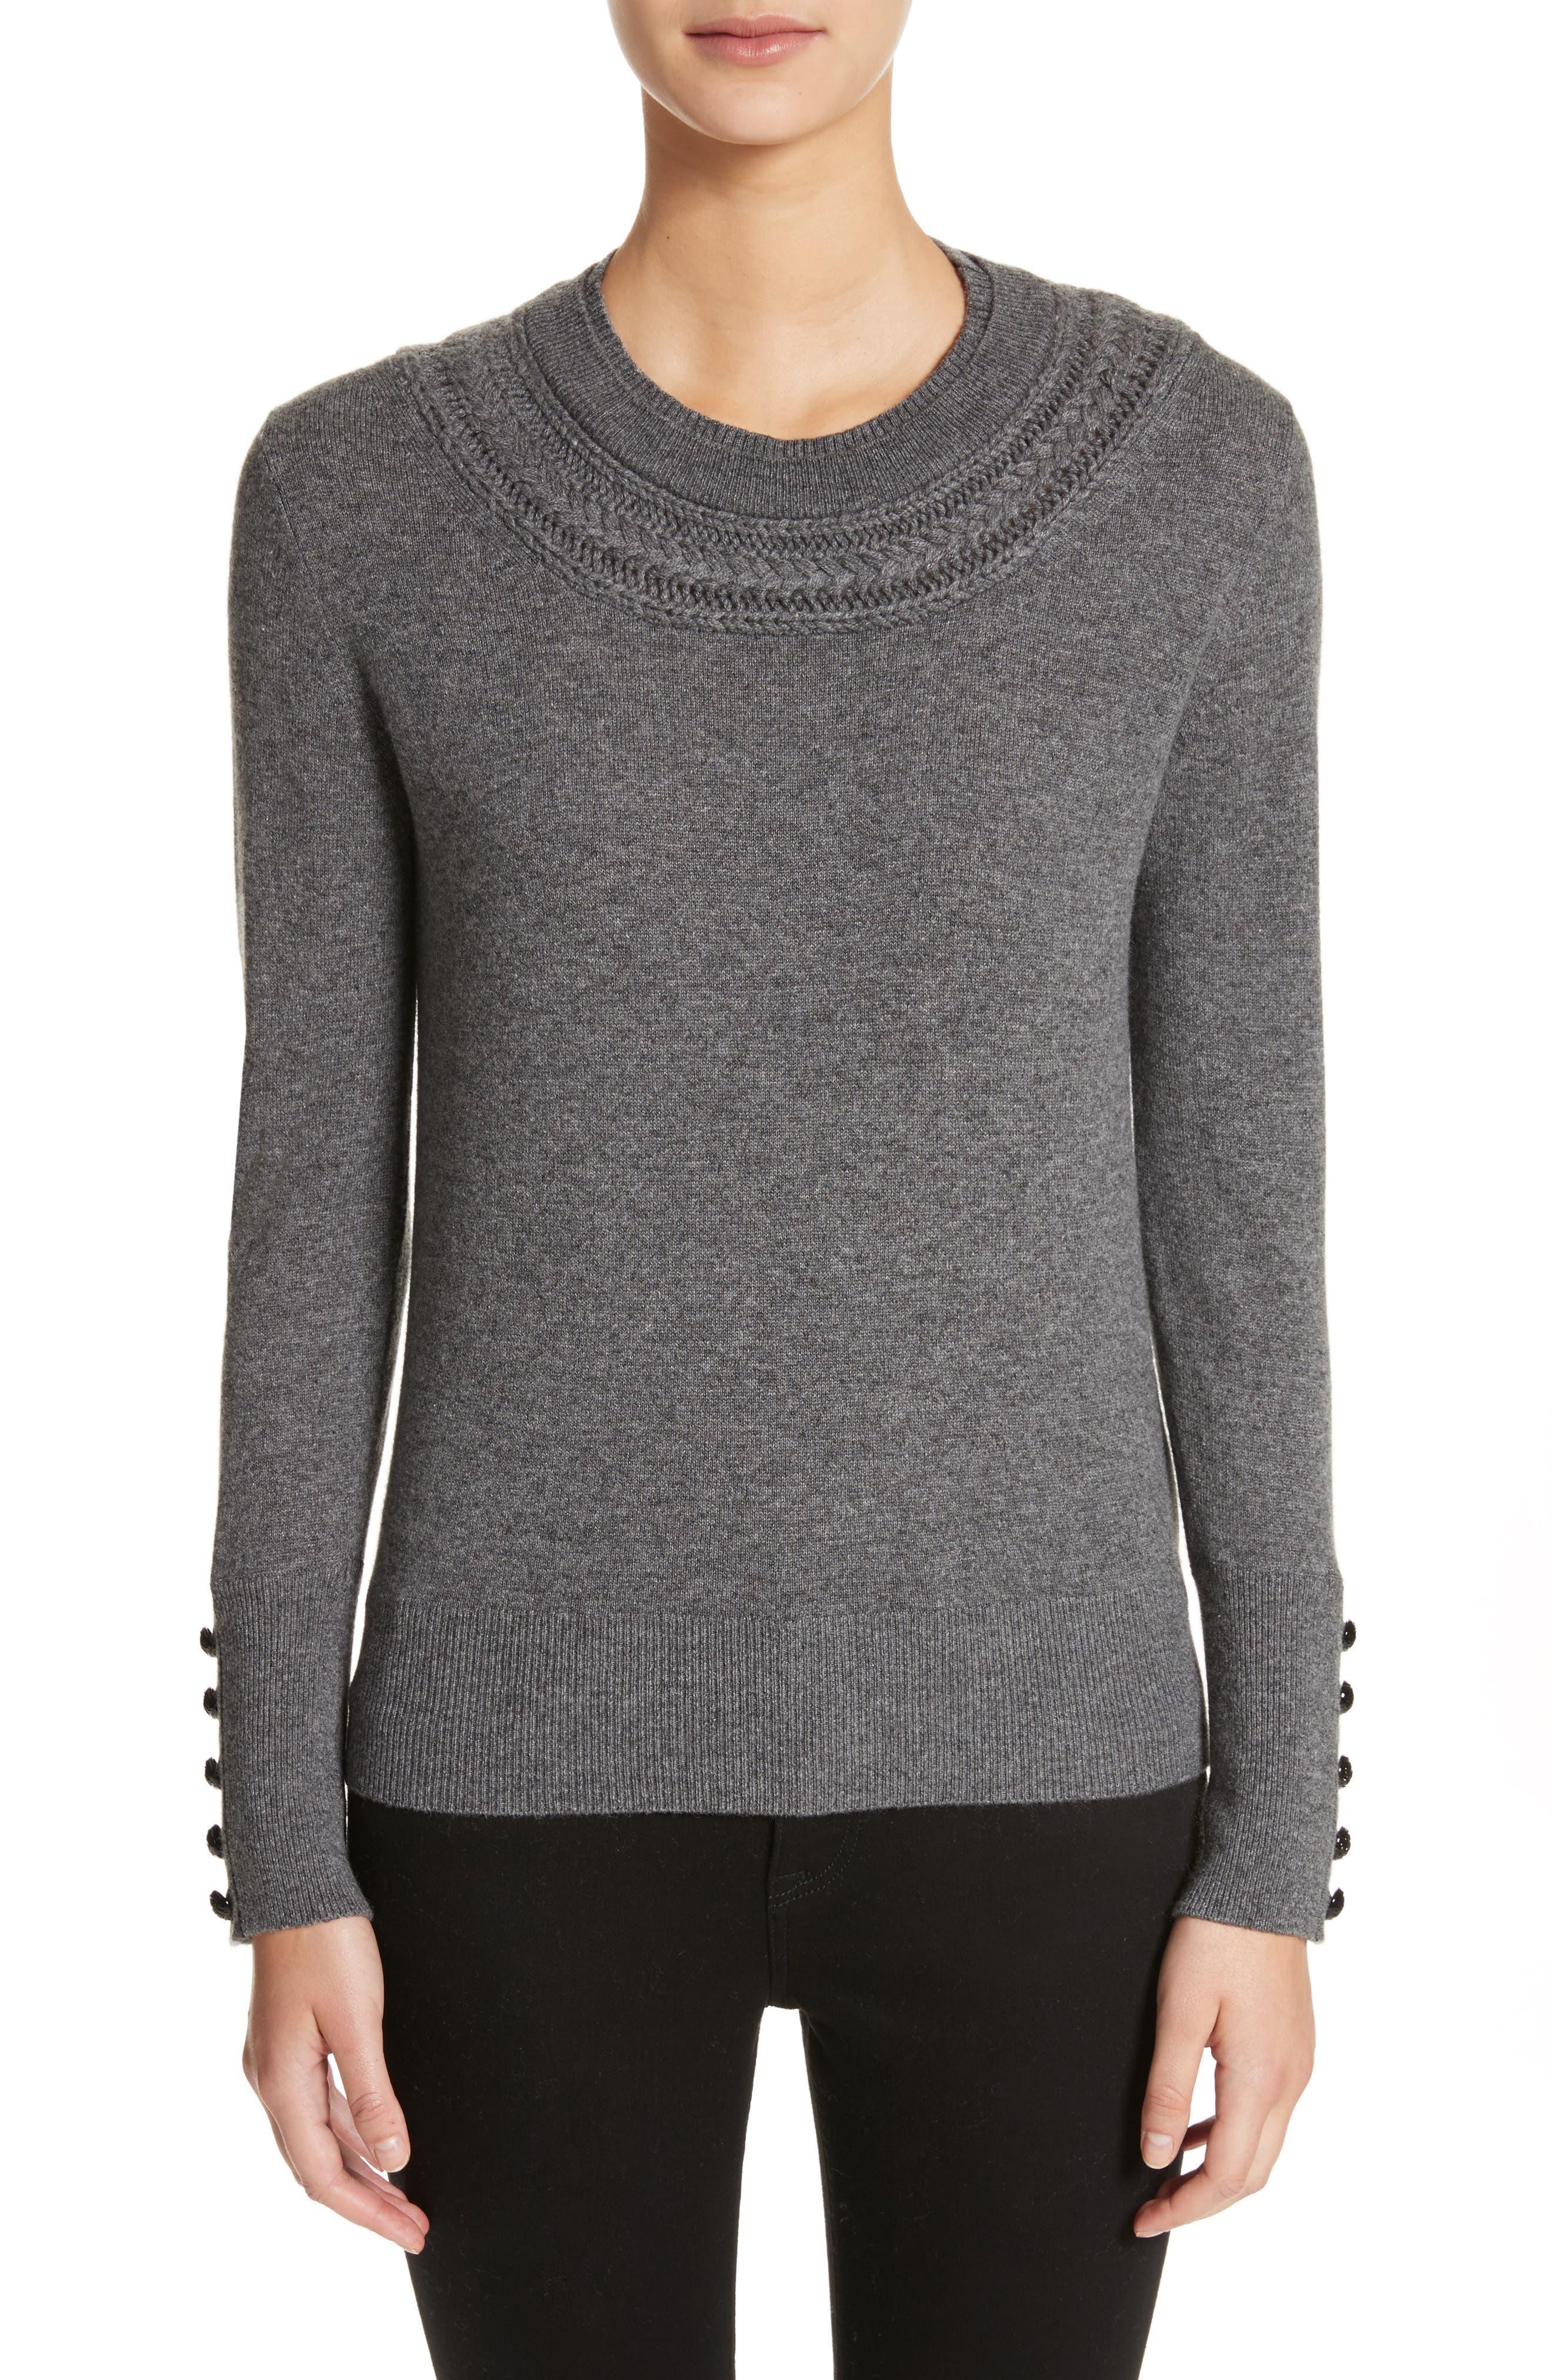 Carapelle Cashmere Sweater,                         Main,                         color,